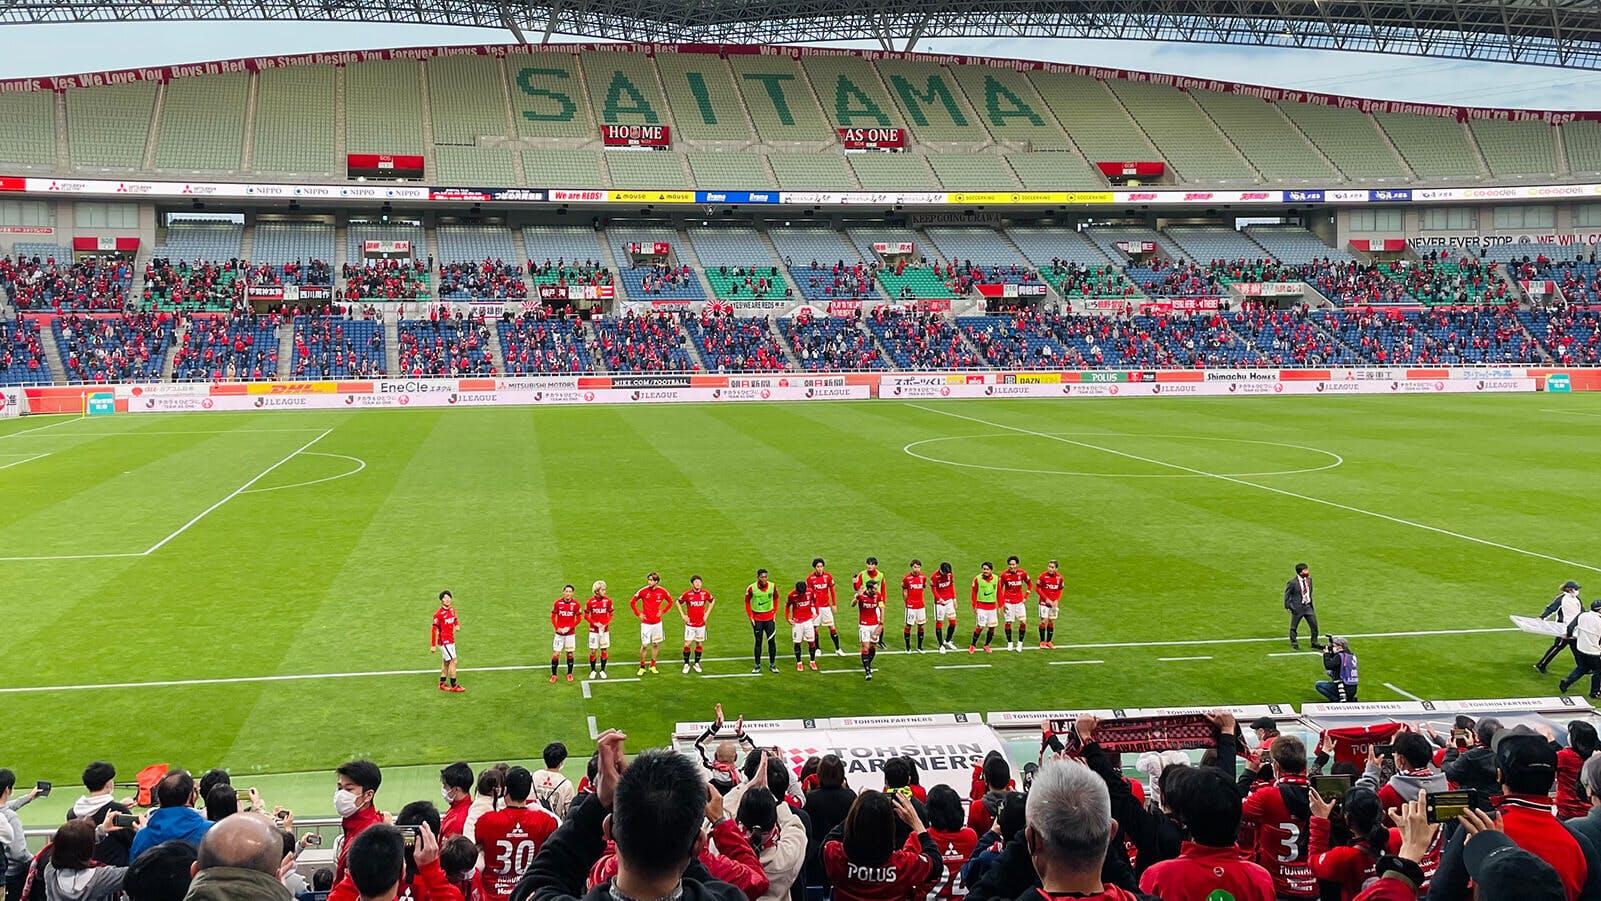 2021 Jリーグ 第9節 埼玉スタジアム2002 徳島ヴォルティス戦